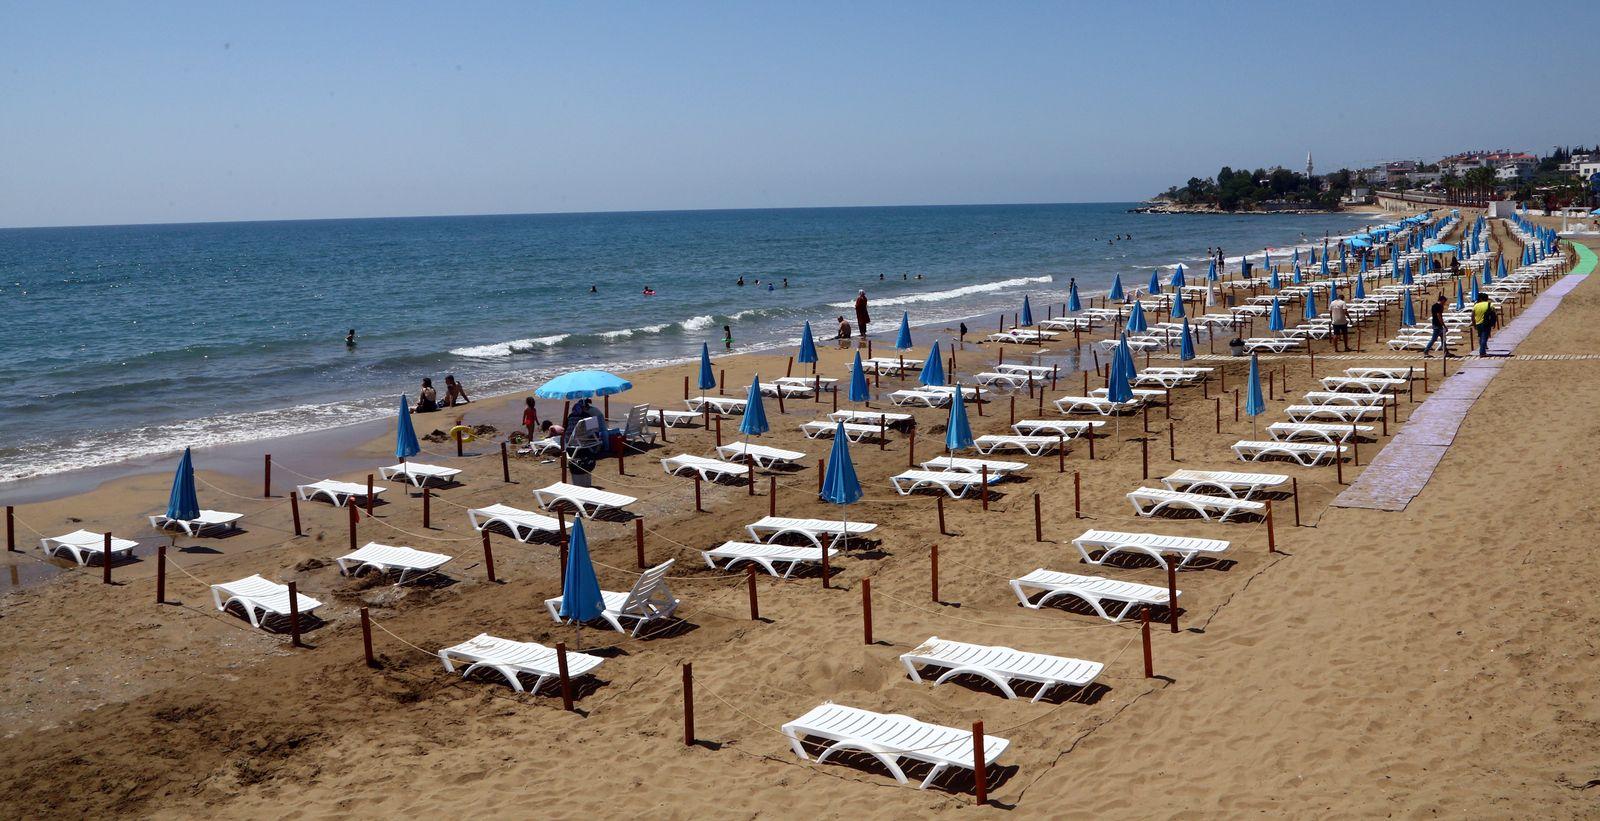 Sunbeds are aligned respecting social distancing on the Yemis Kumu beach near Mersin